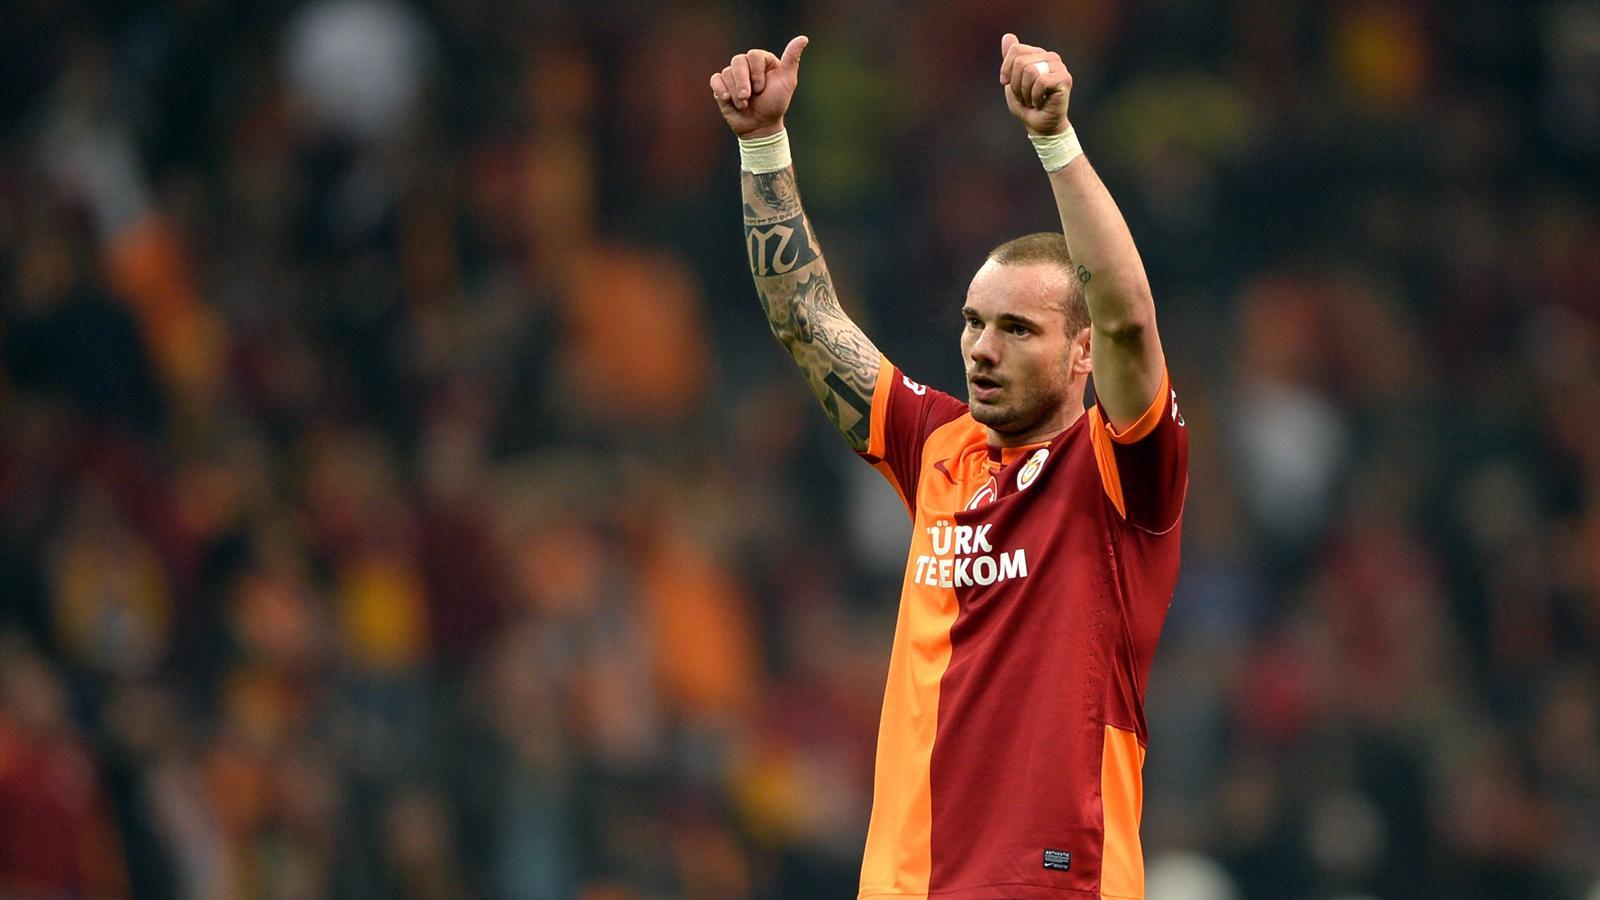 Vers un transfert de Sneijder au PSG ?